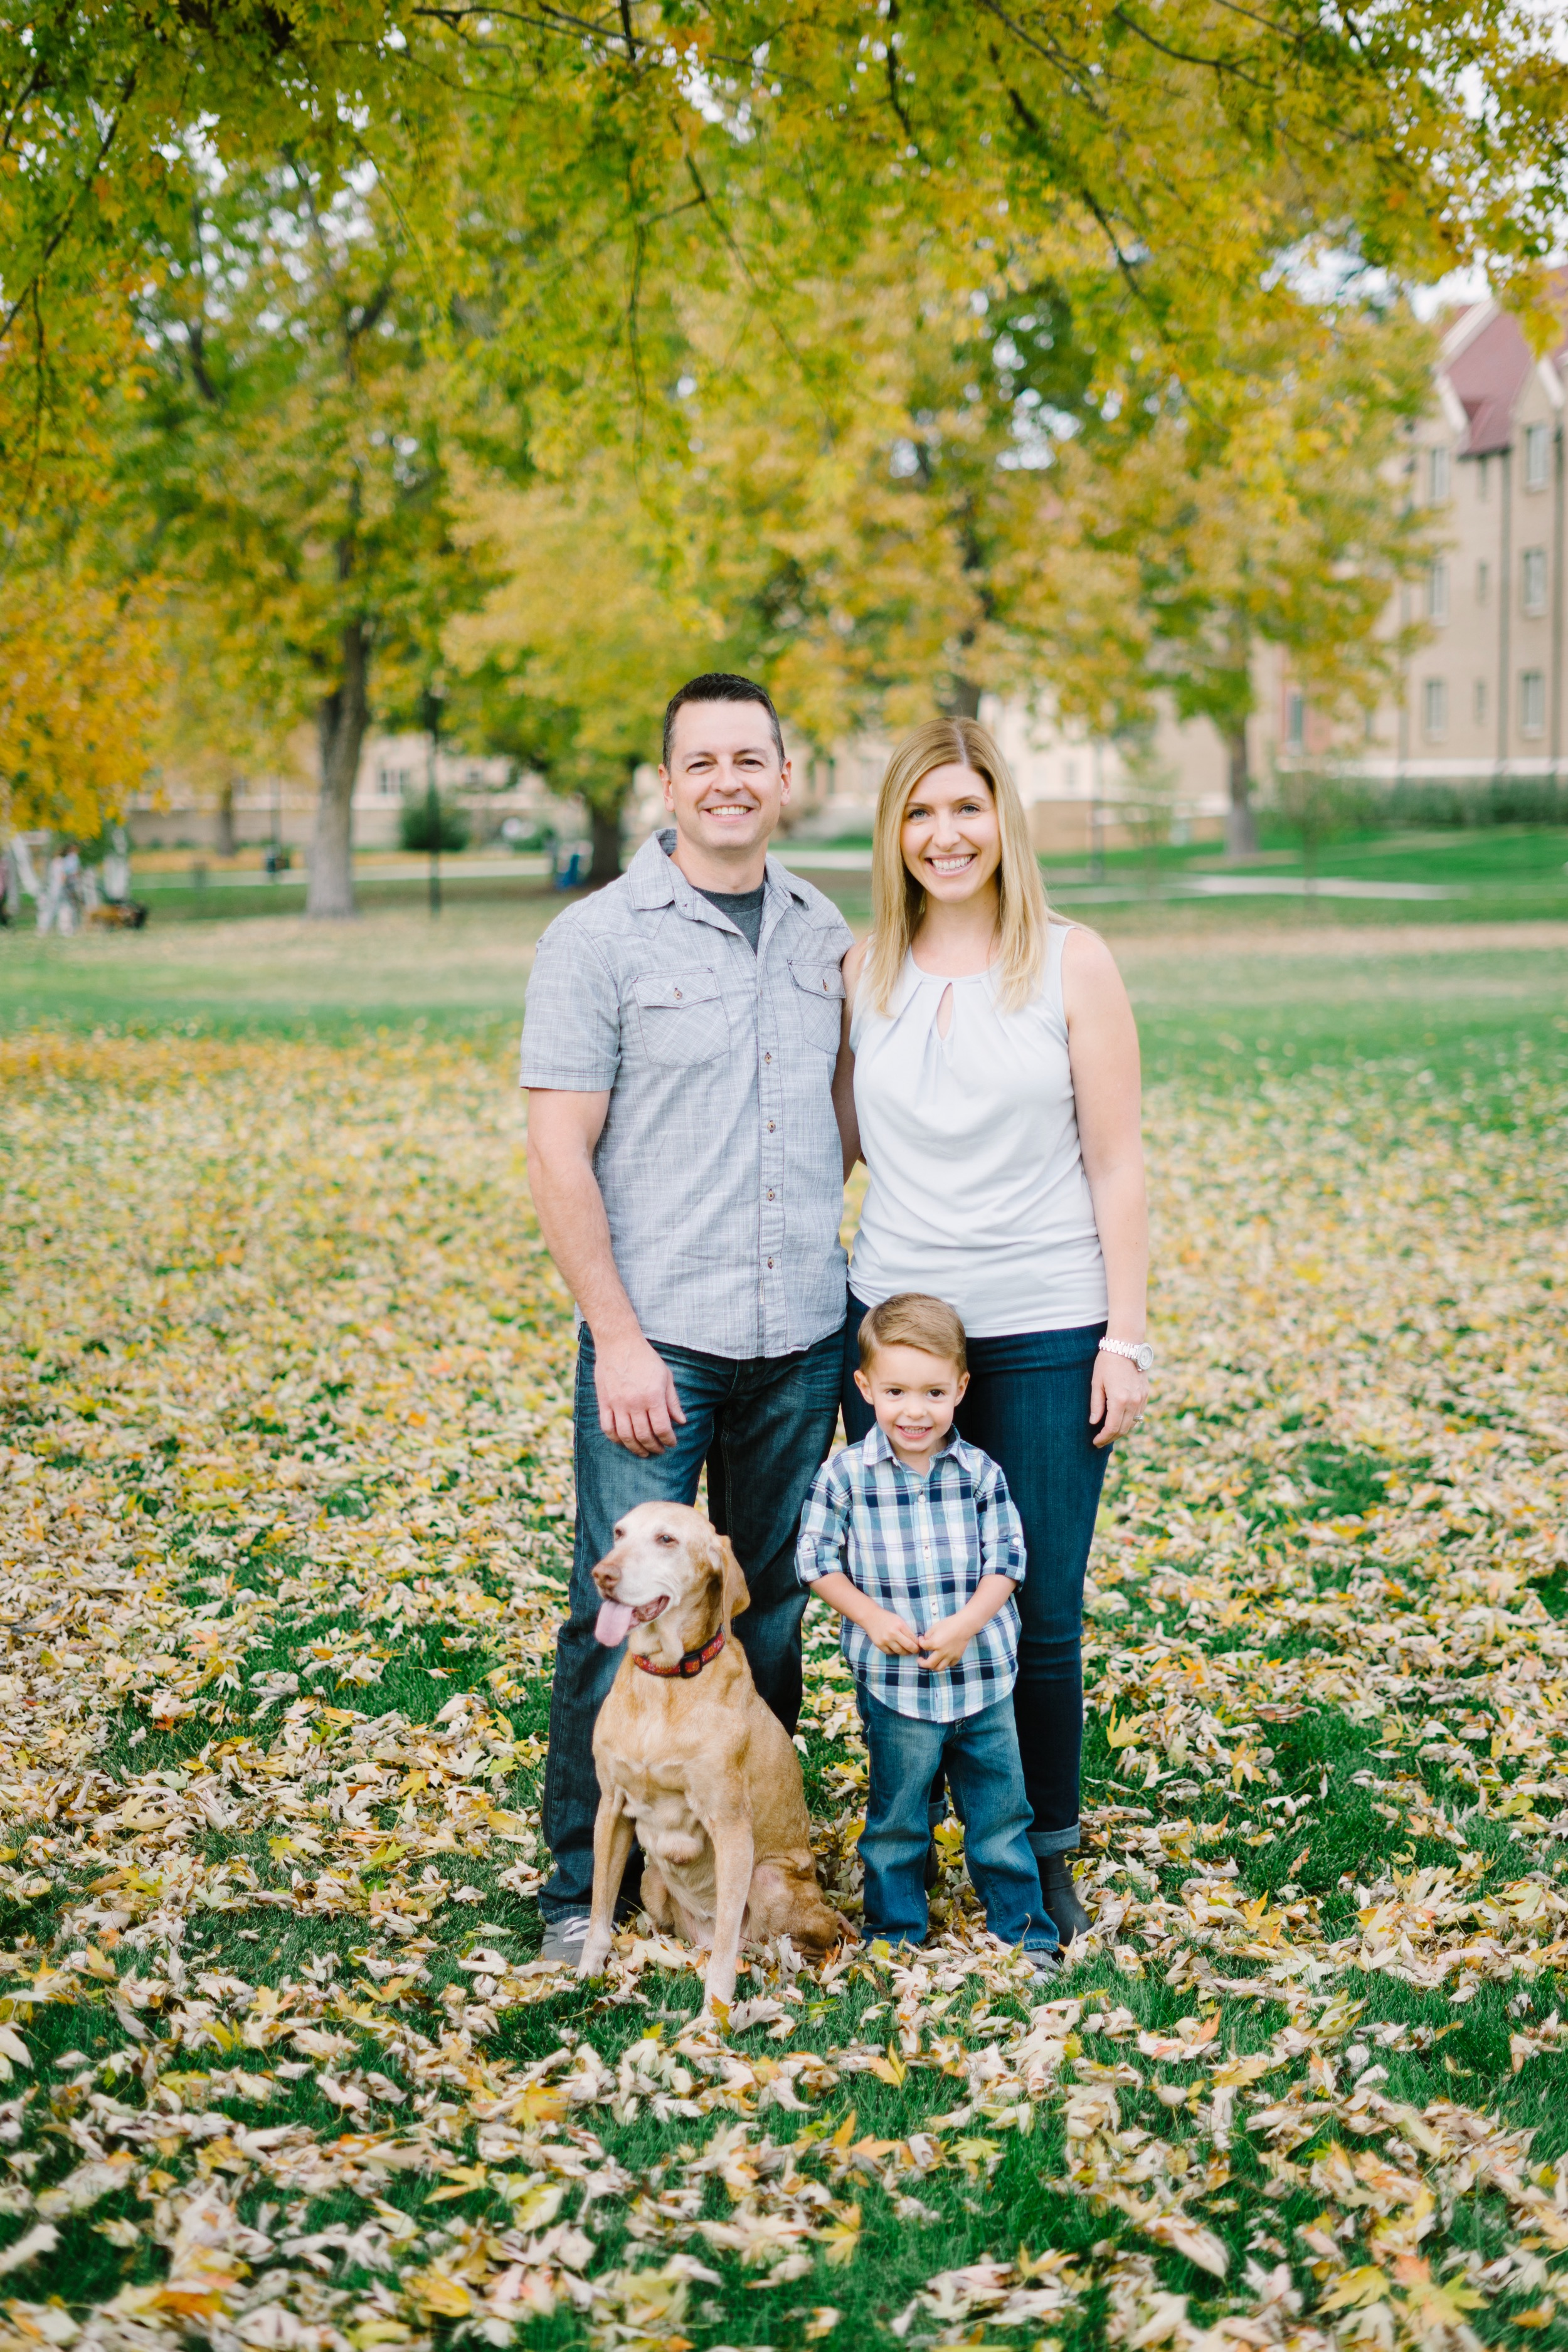 Denver Family Photography Dr. Bates - 6.jpg